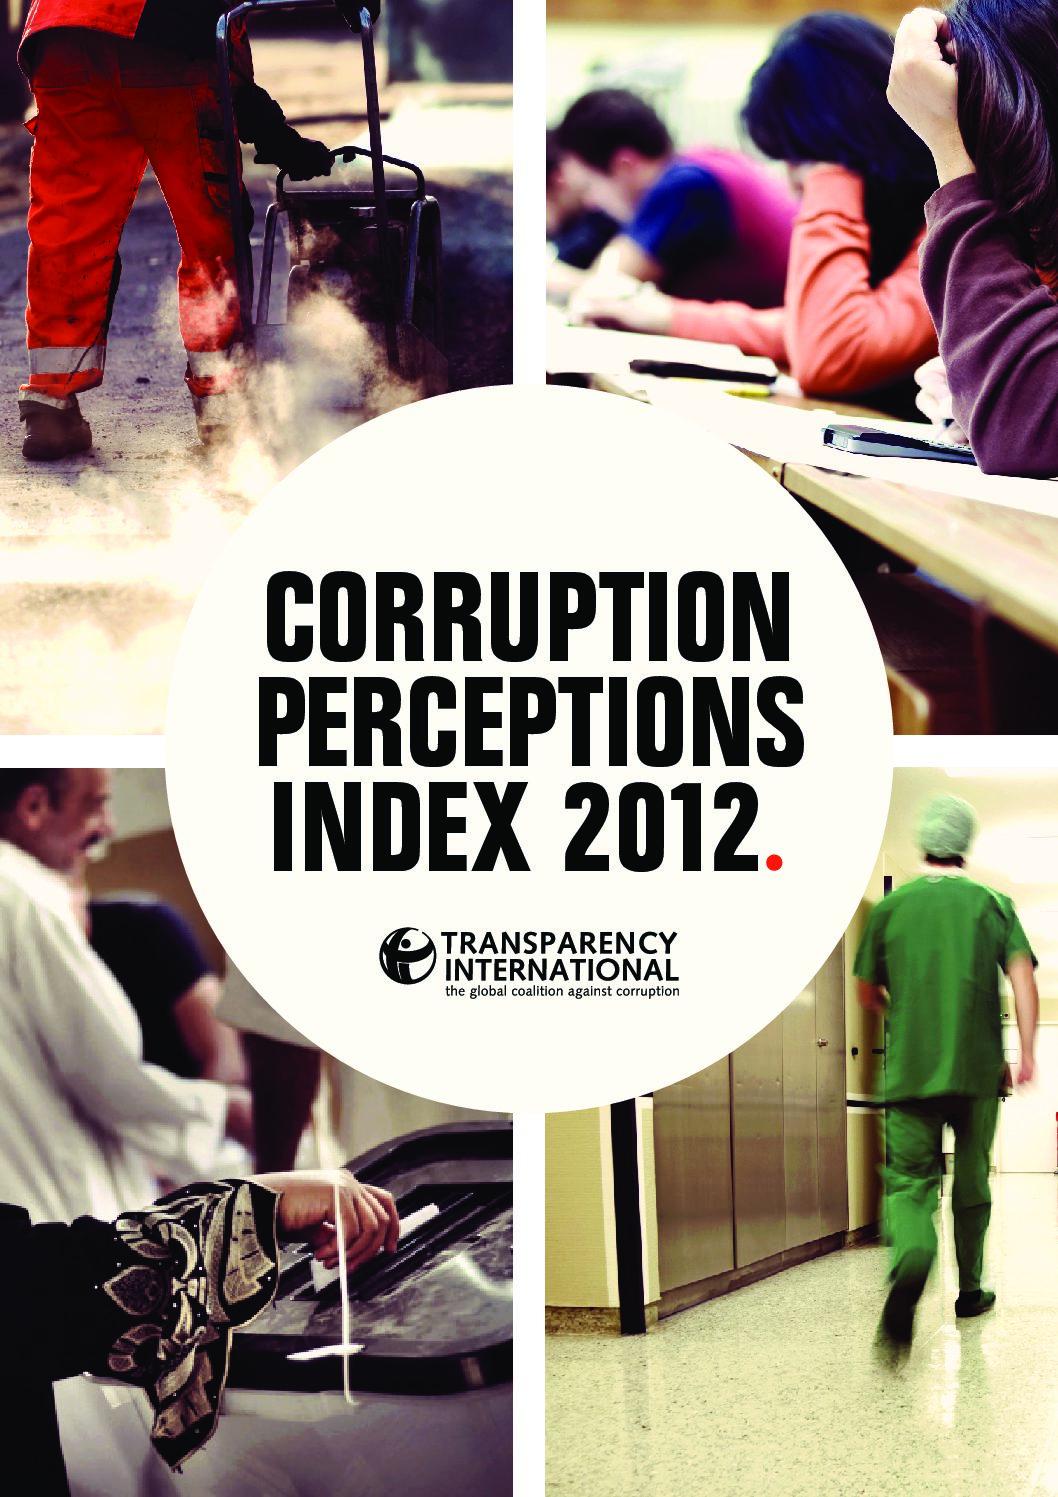 Corruption Perception Index 2012